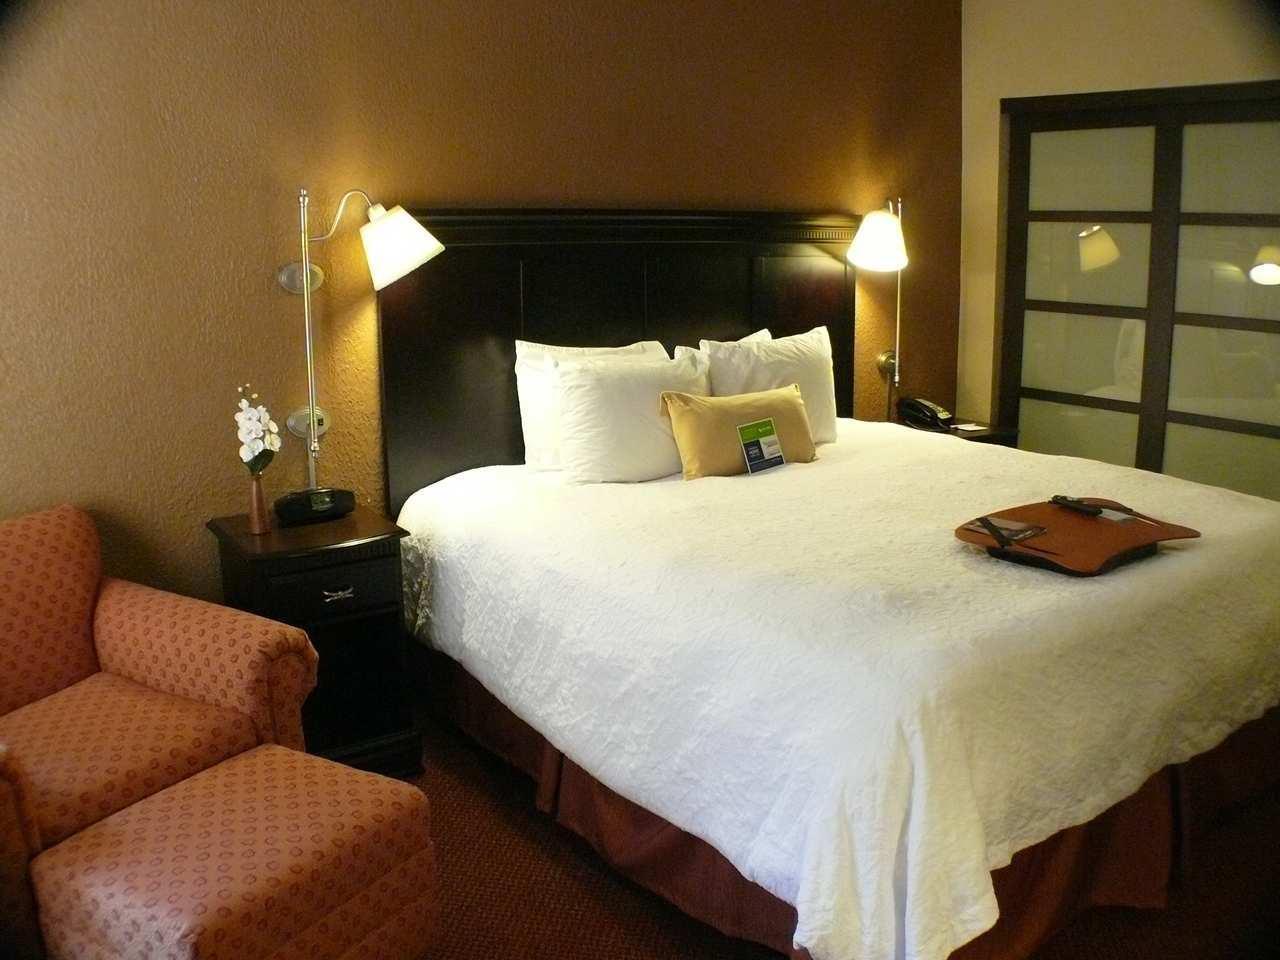 Hampton Inn & Suites Chicago/Hoffman Estates image 12